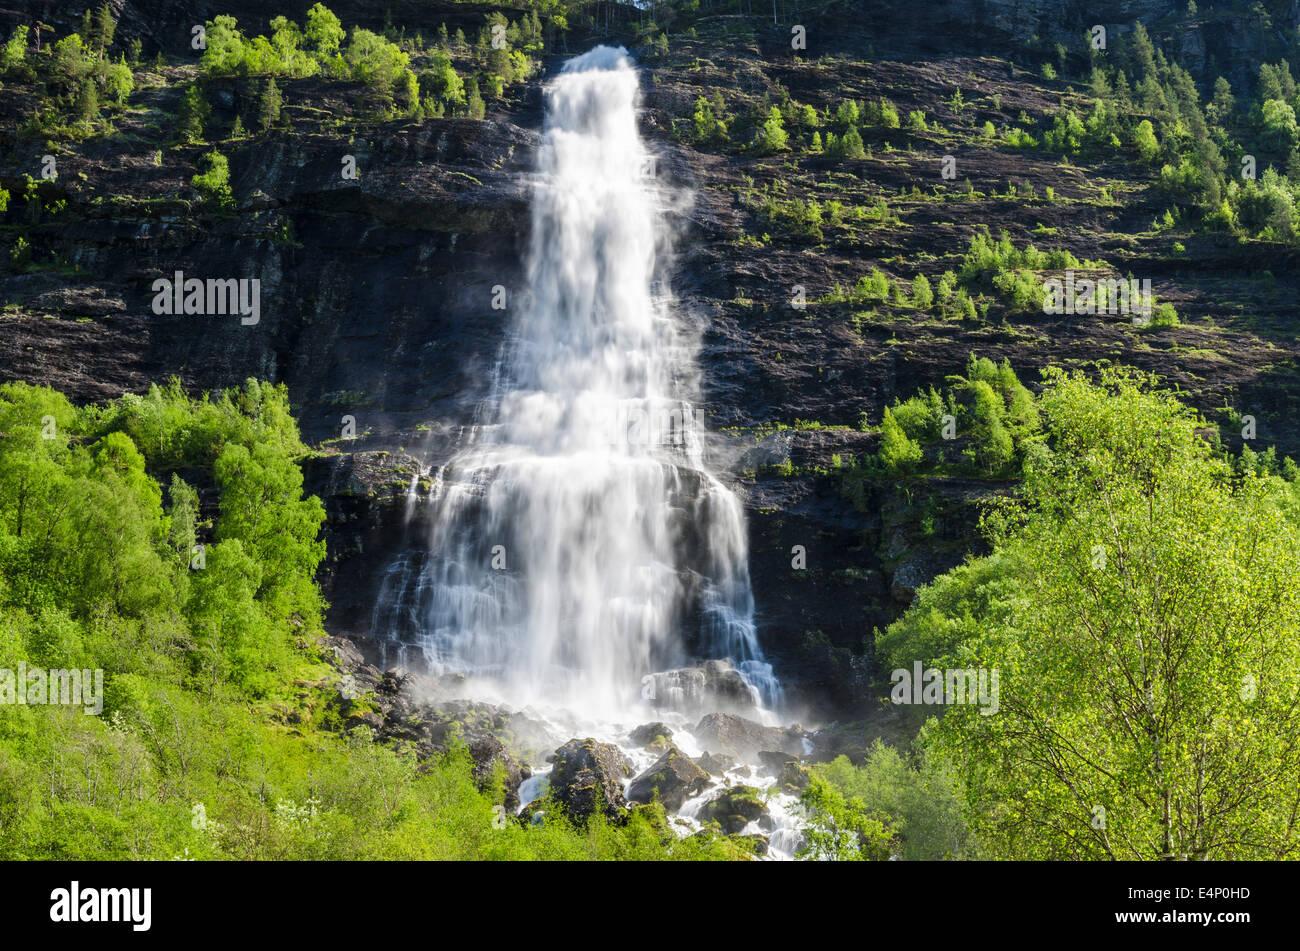 Wasserfall, Fortundalen (Fortunsdalen), Luster, Sogn og Fjordane Fylke, Norwegen, - Stock Image